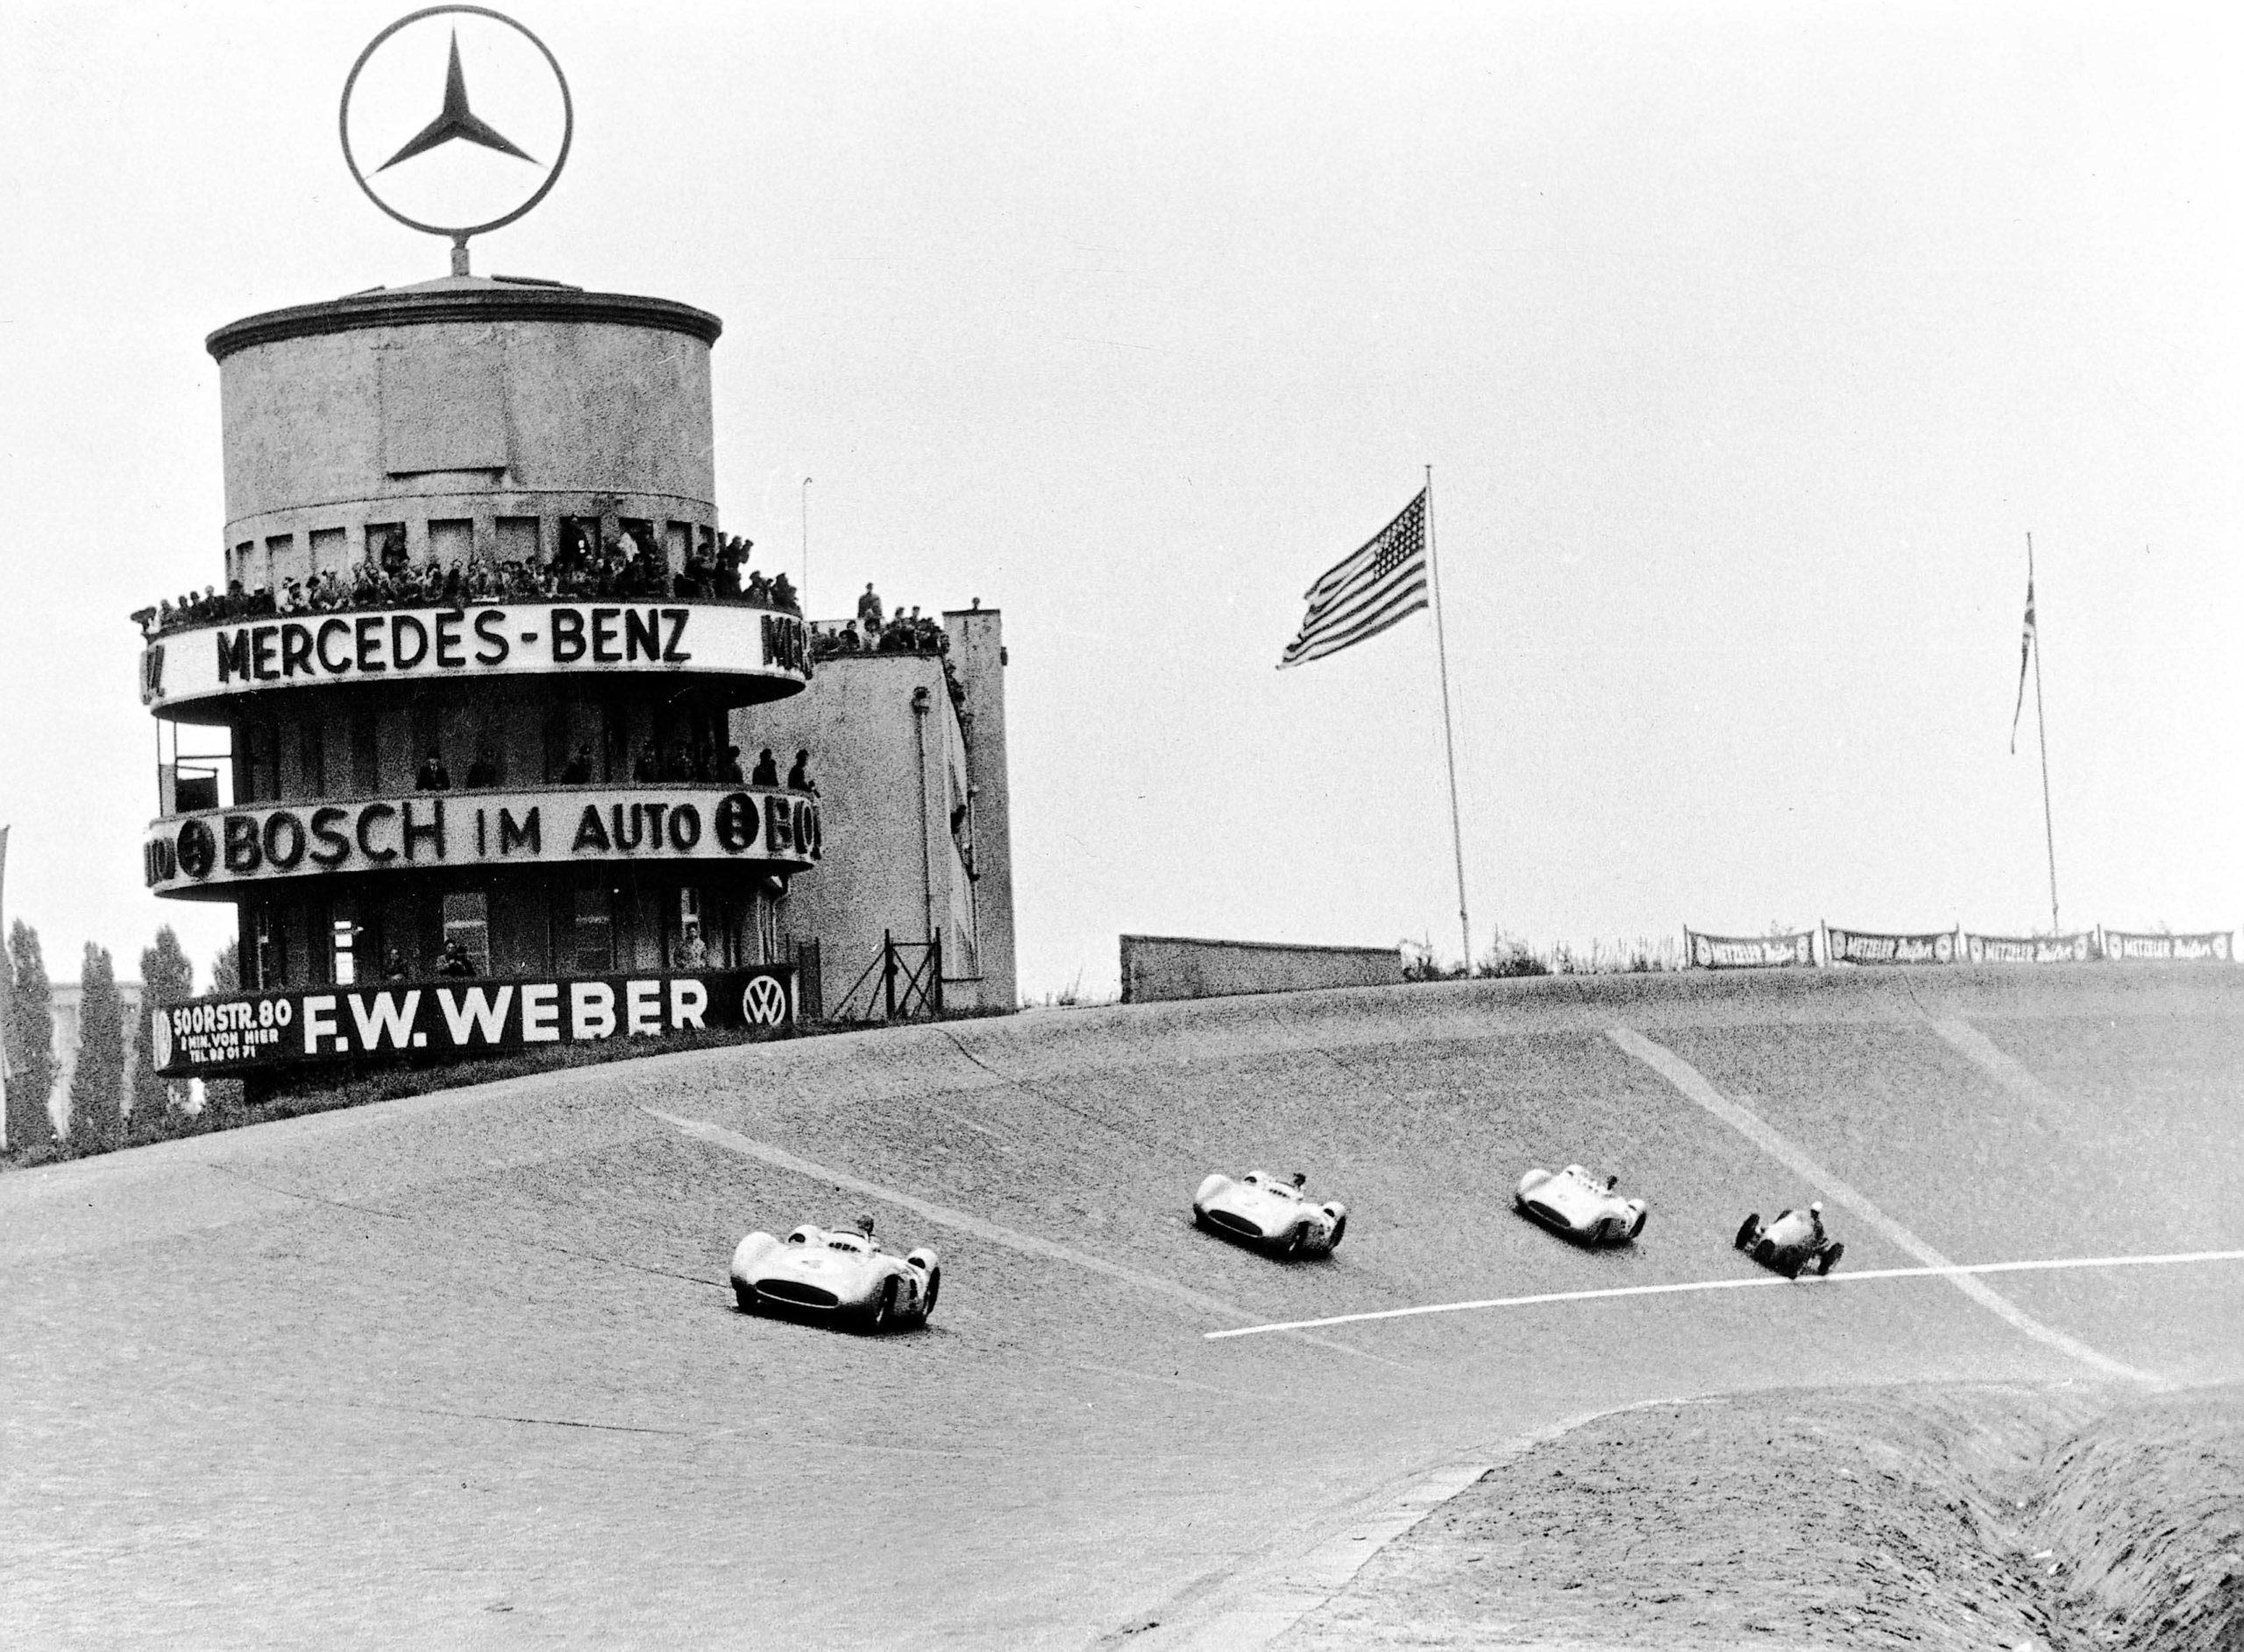 Jean-Behra-follows-Kling-Fangio-and-Hermann-at-Avus-in-1954